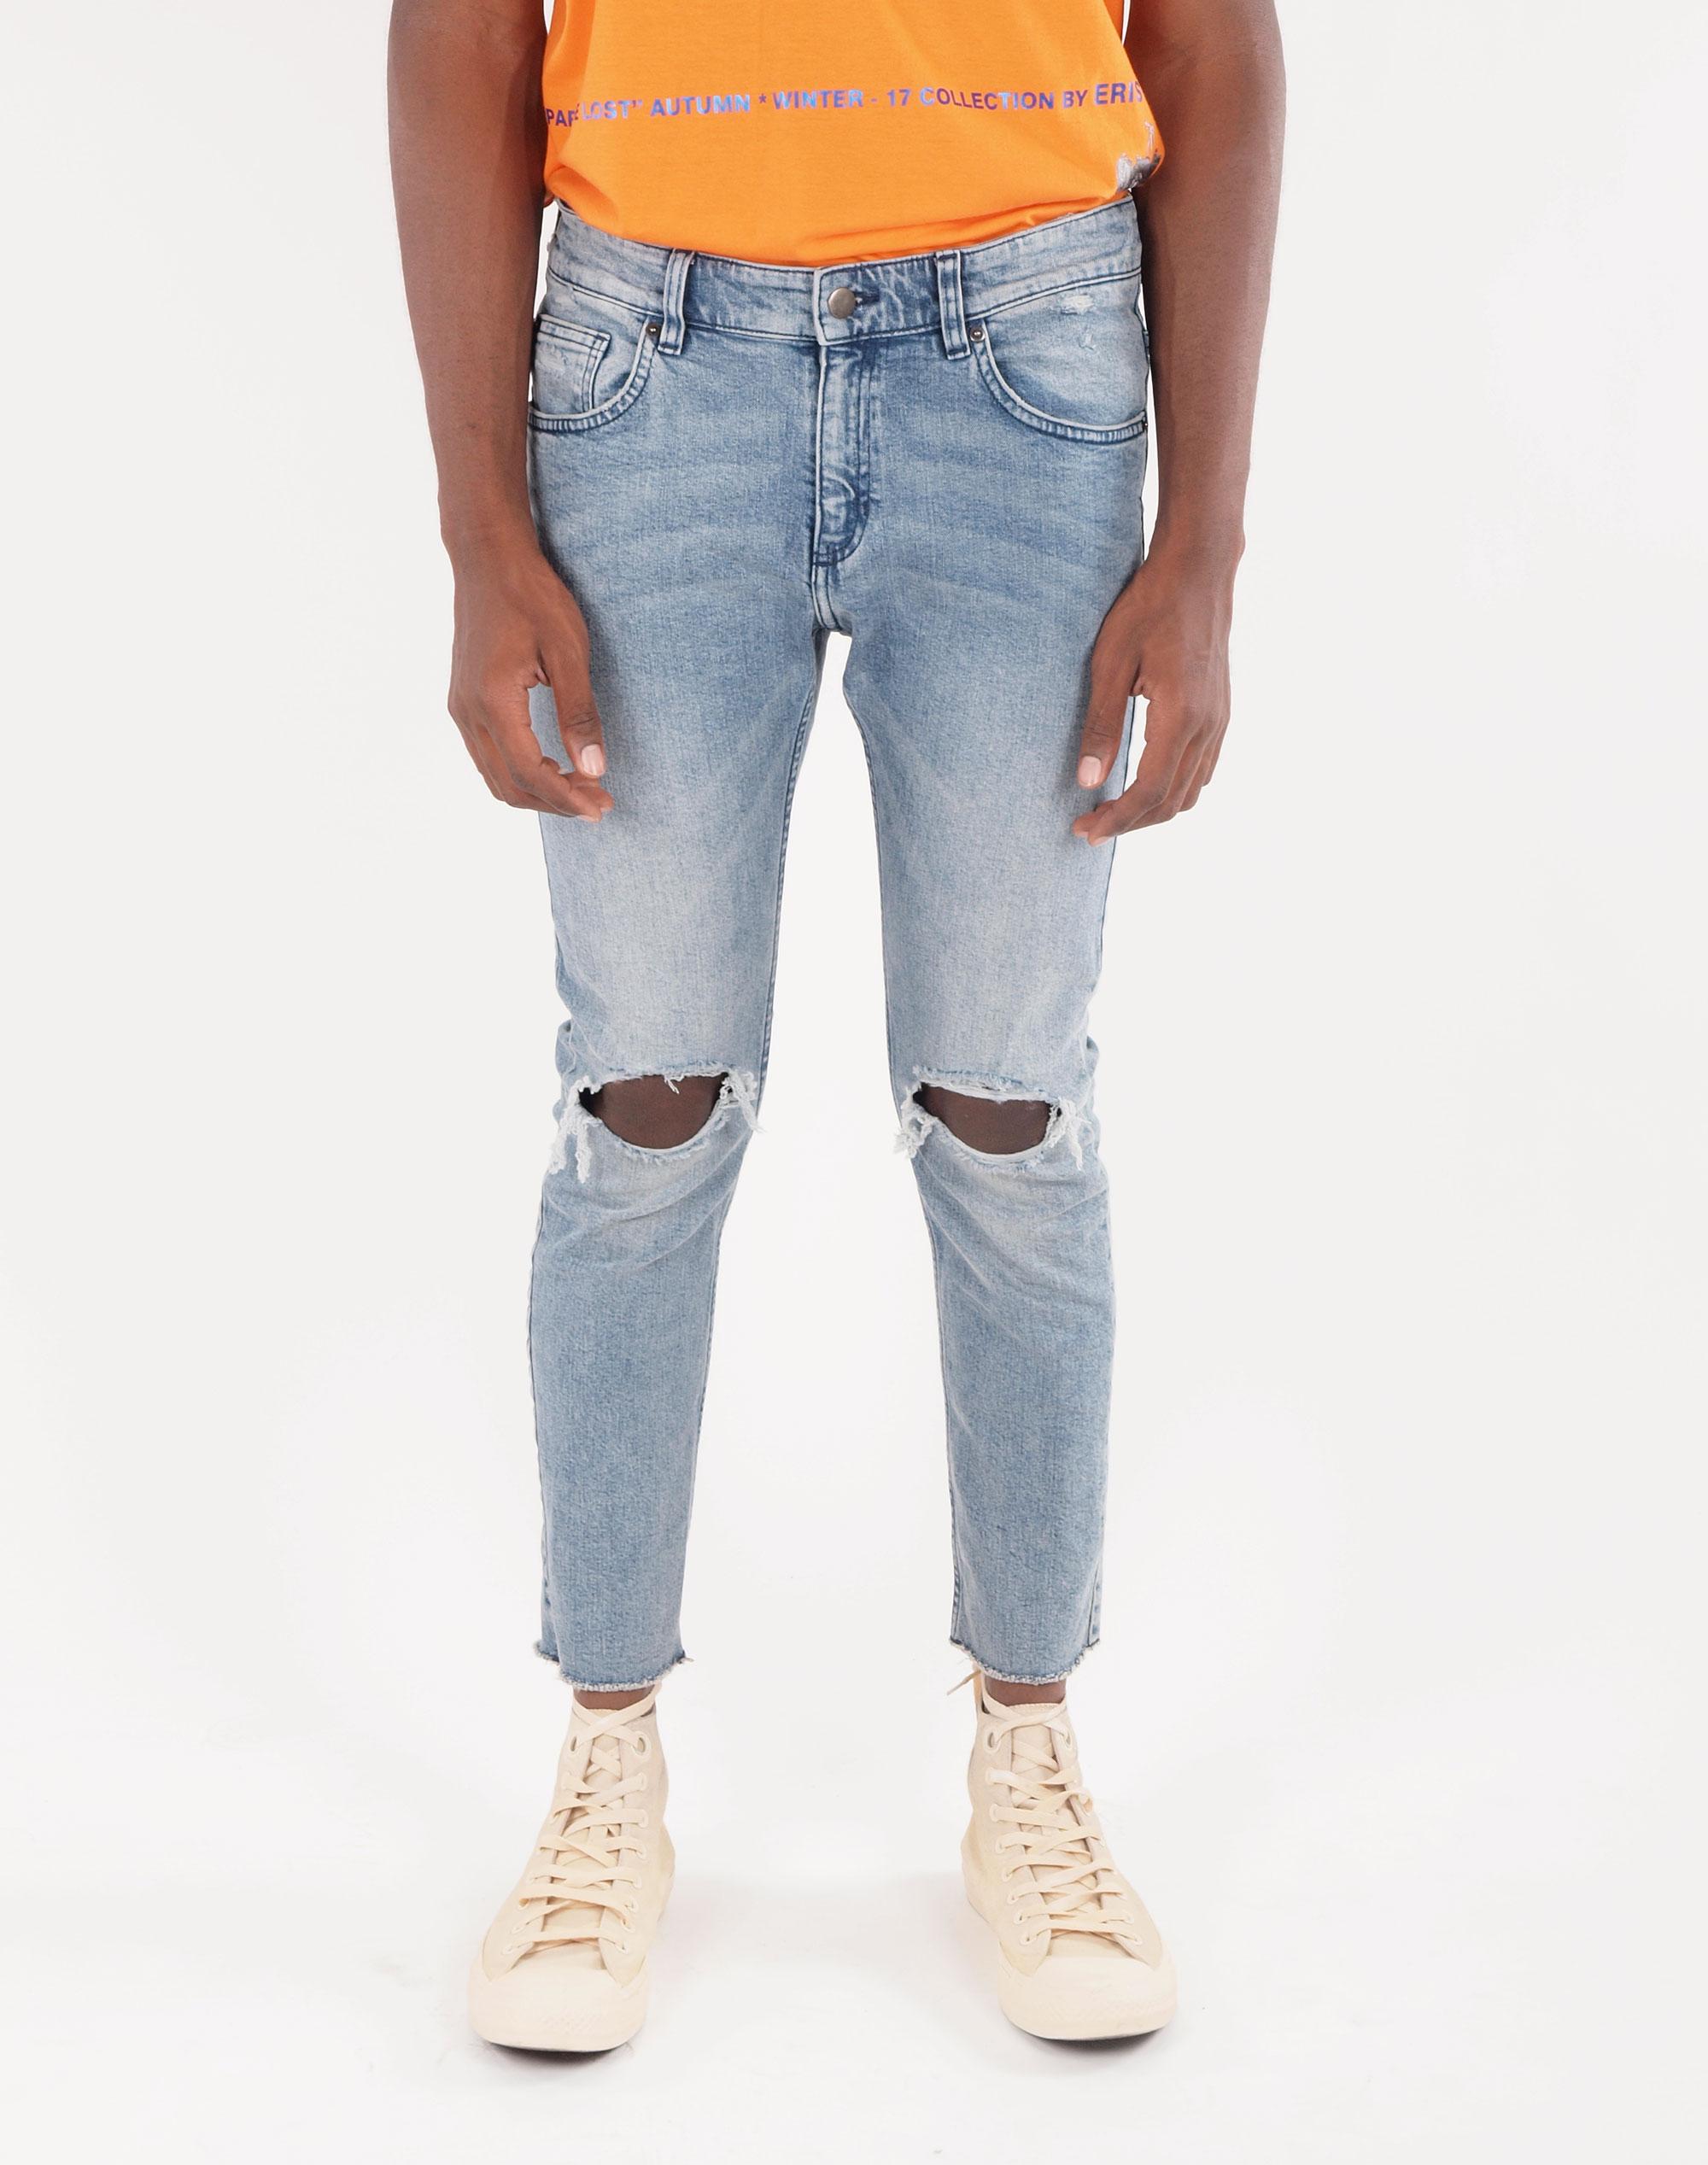 ankle-length-skinny-jeans.jpg